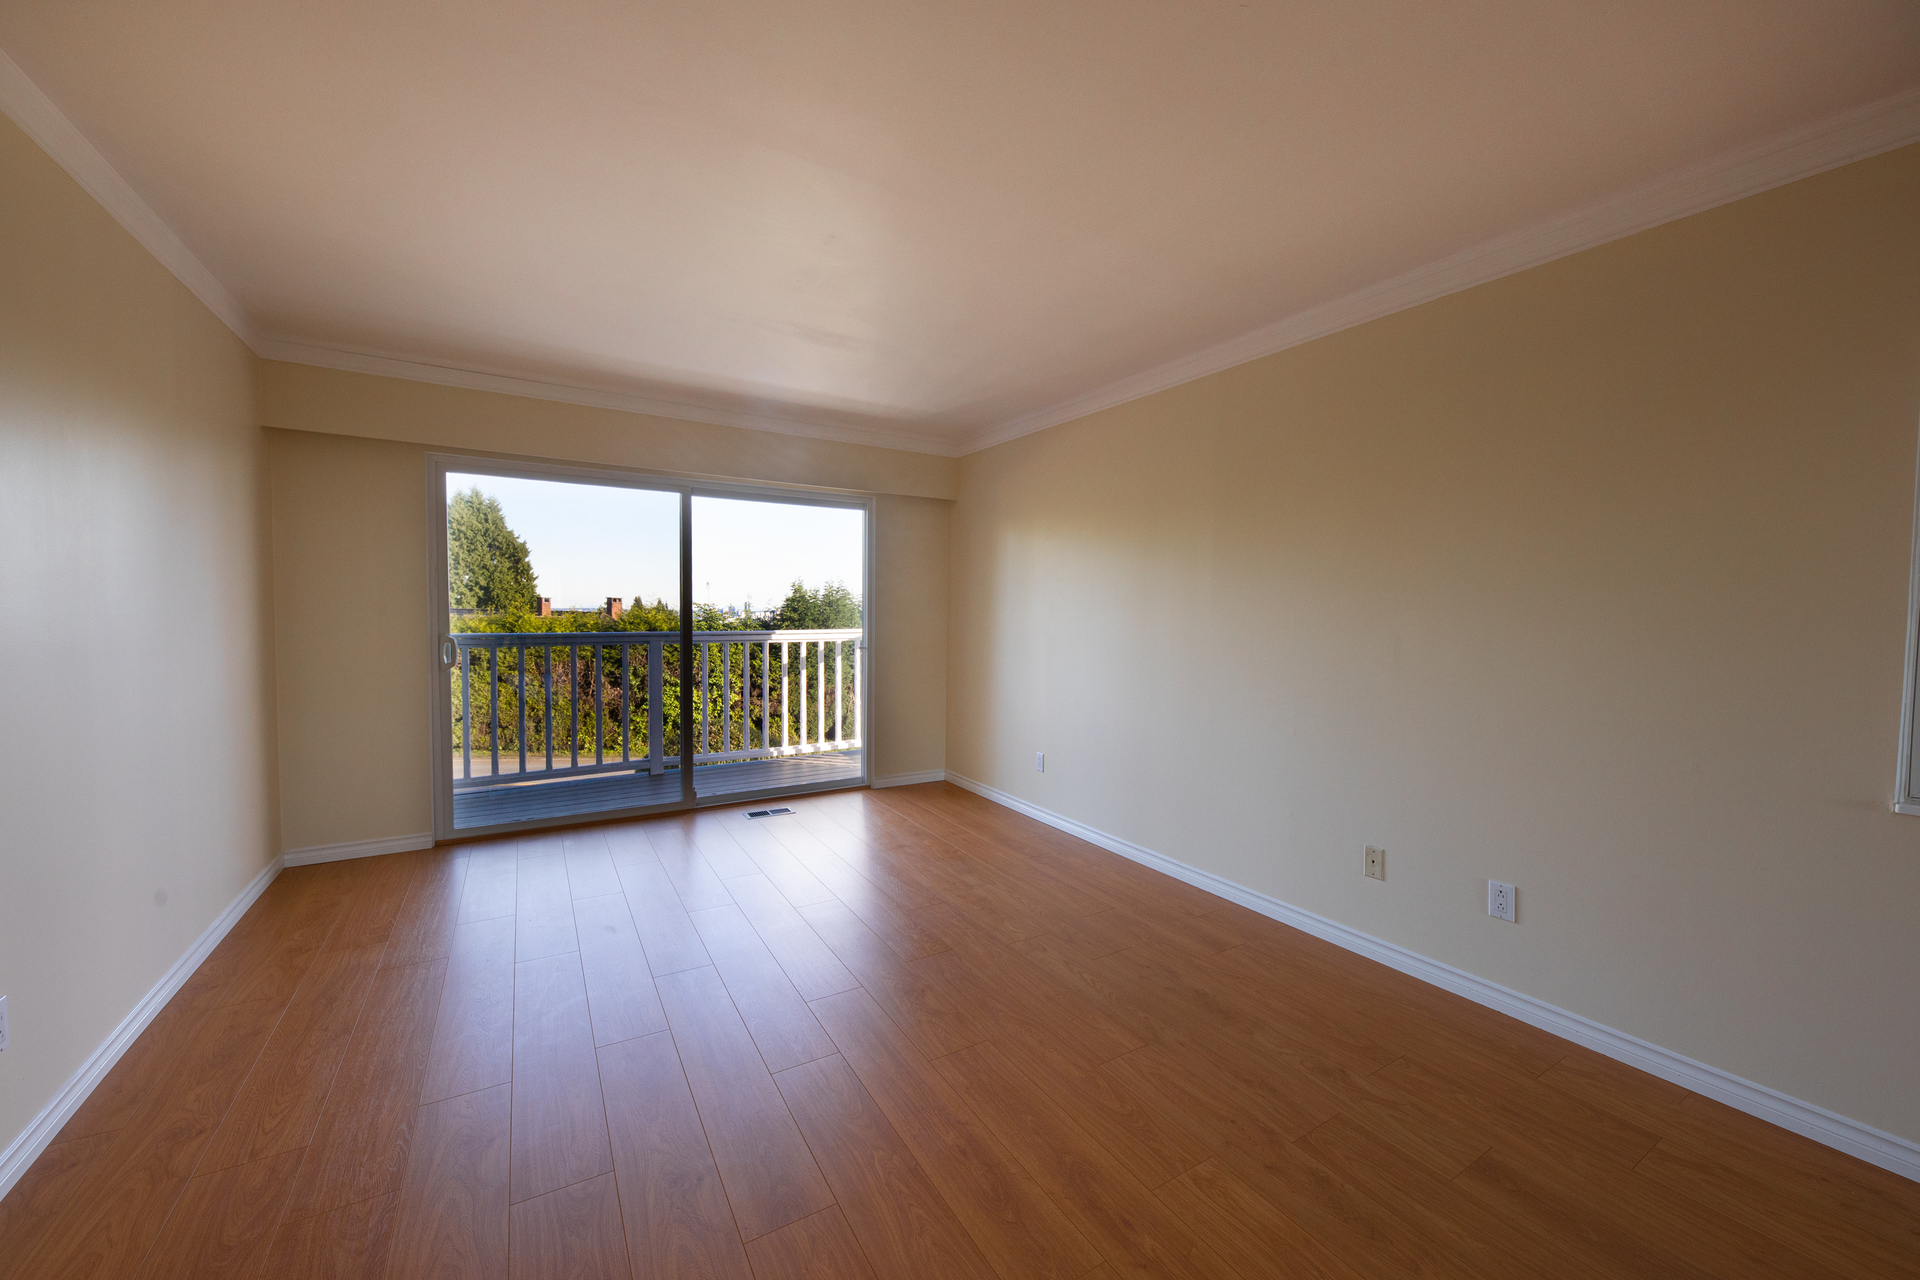 interior_05 at 997 Cross Creek Road, British Properties, West Vancouver